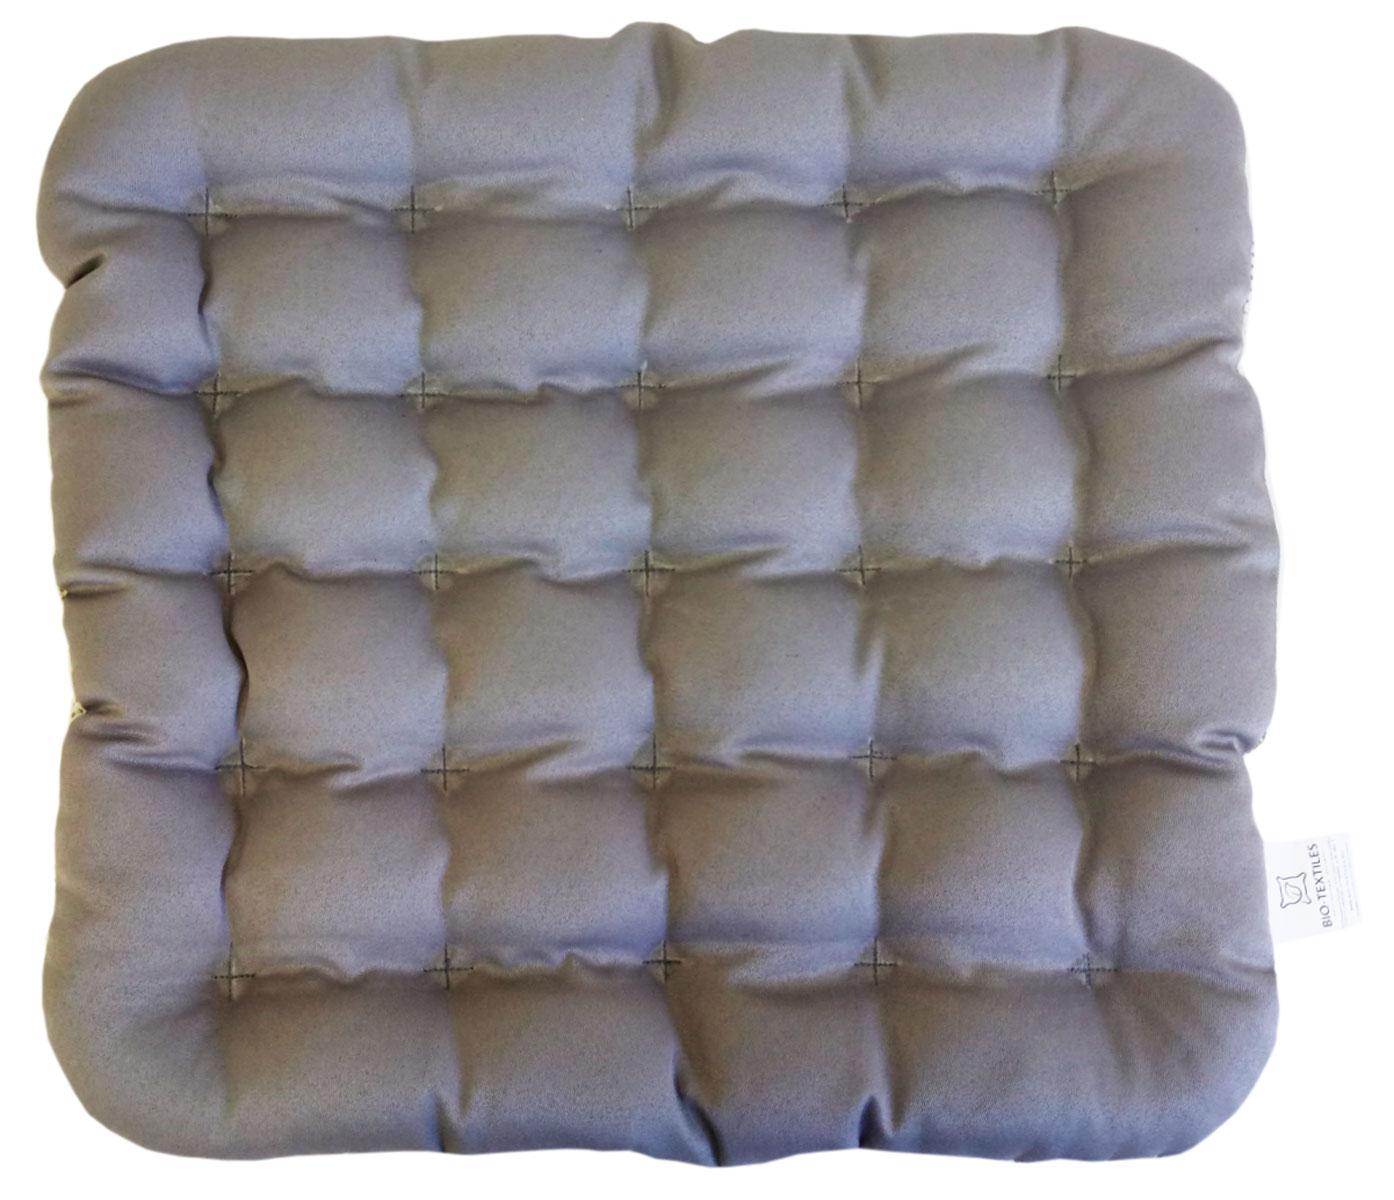 Подушка на стул Bio-Textiles Био, наполнитель: лузга гречихи, 40 х 40 см. PEK999PEK999